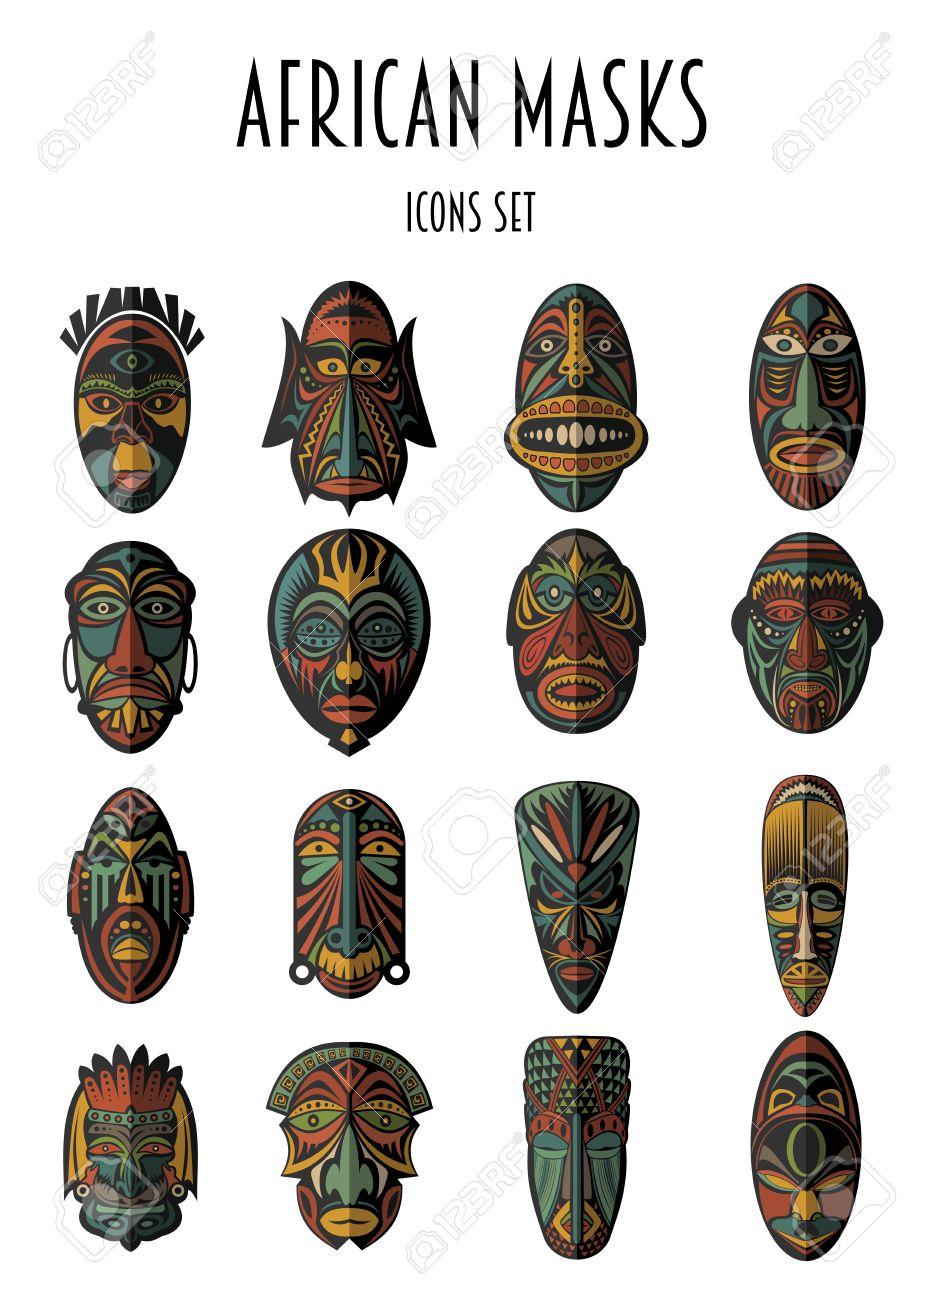 Set of African Ethnic Tribal masks on white background. Flat icons. Ritual symbols. - 51823575